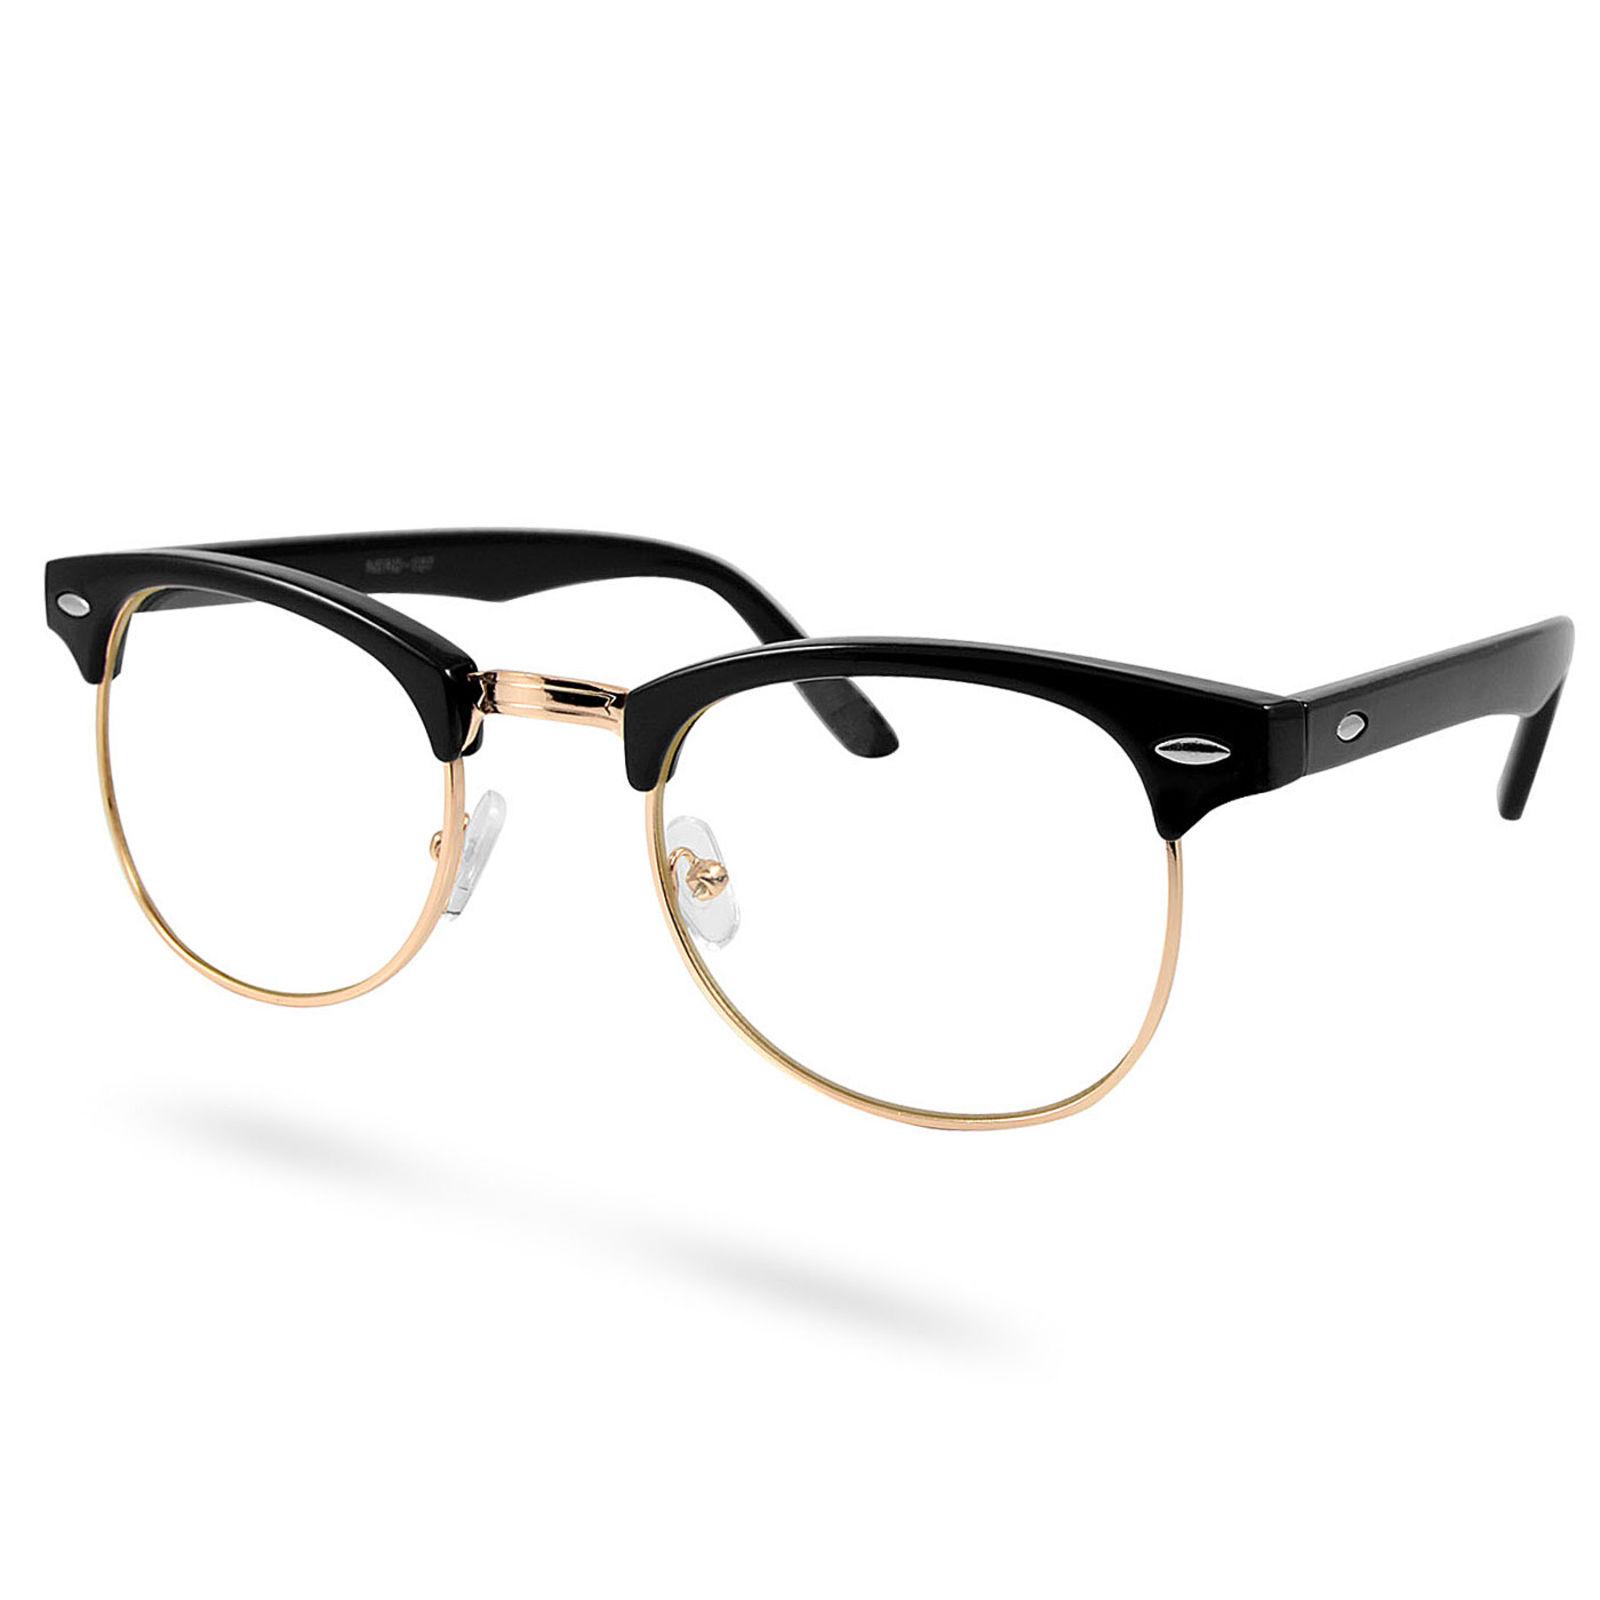 3301054d7 EverShade Čierno-zlaté vintage okuliare s čírymi šošovkami - Glami.sk